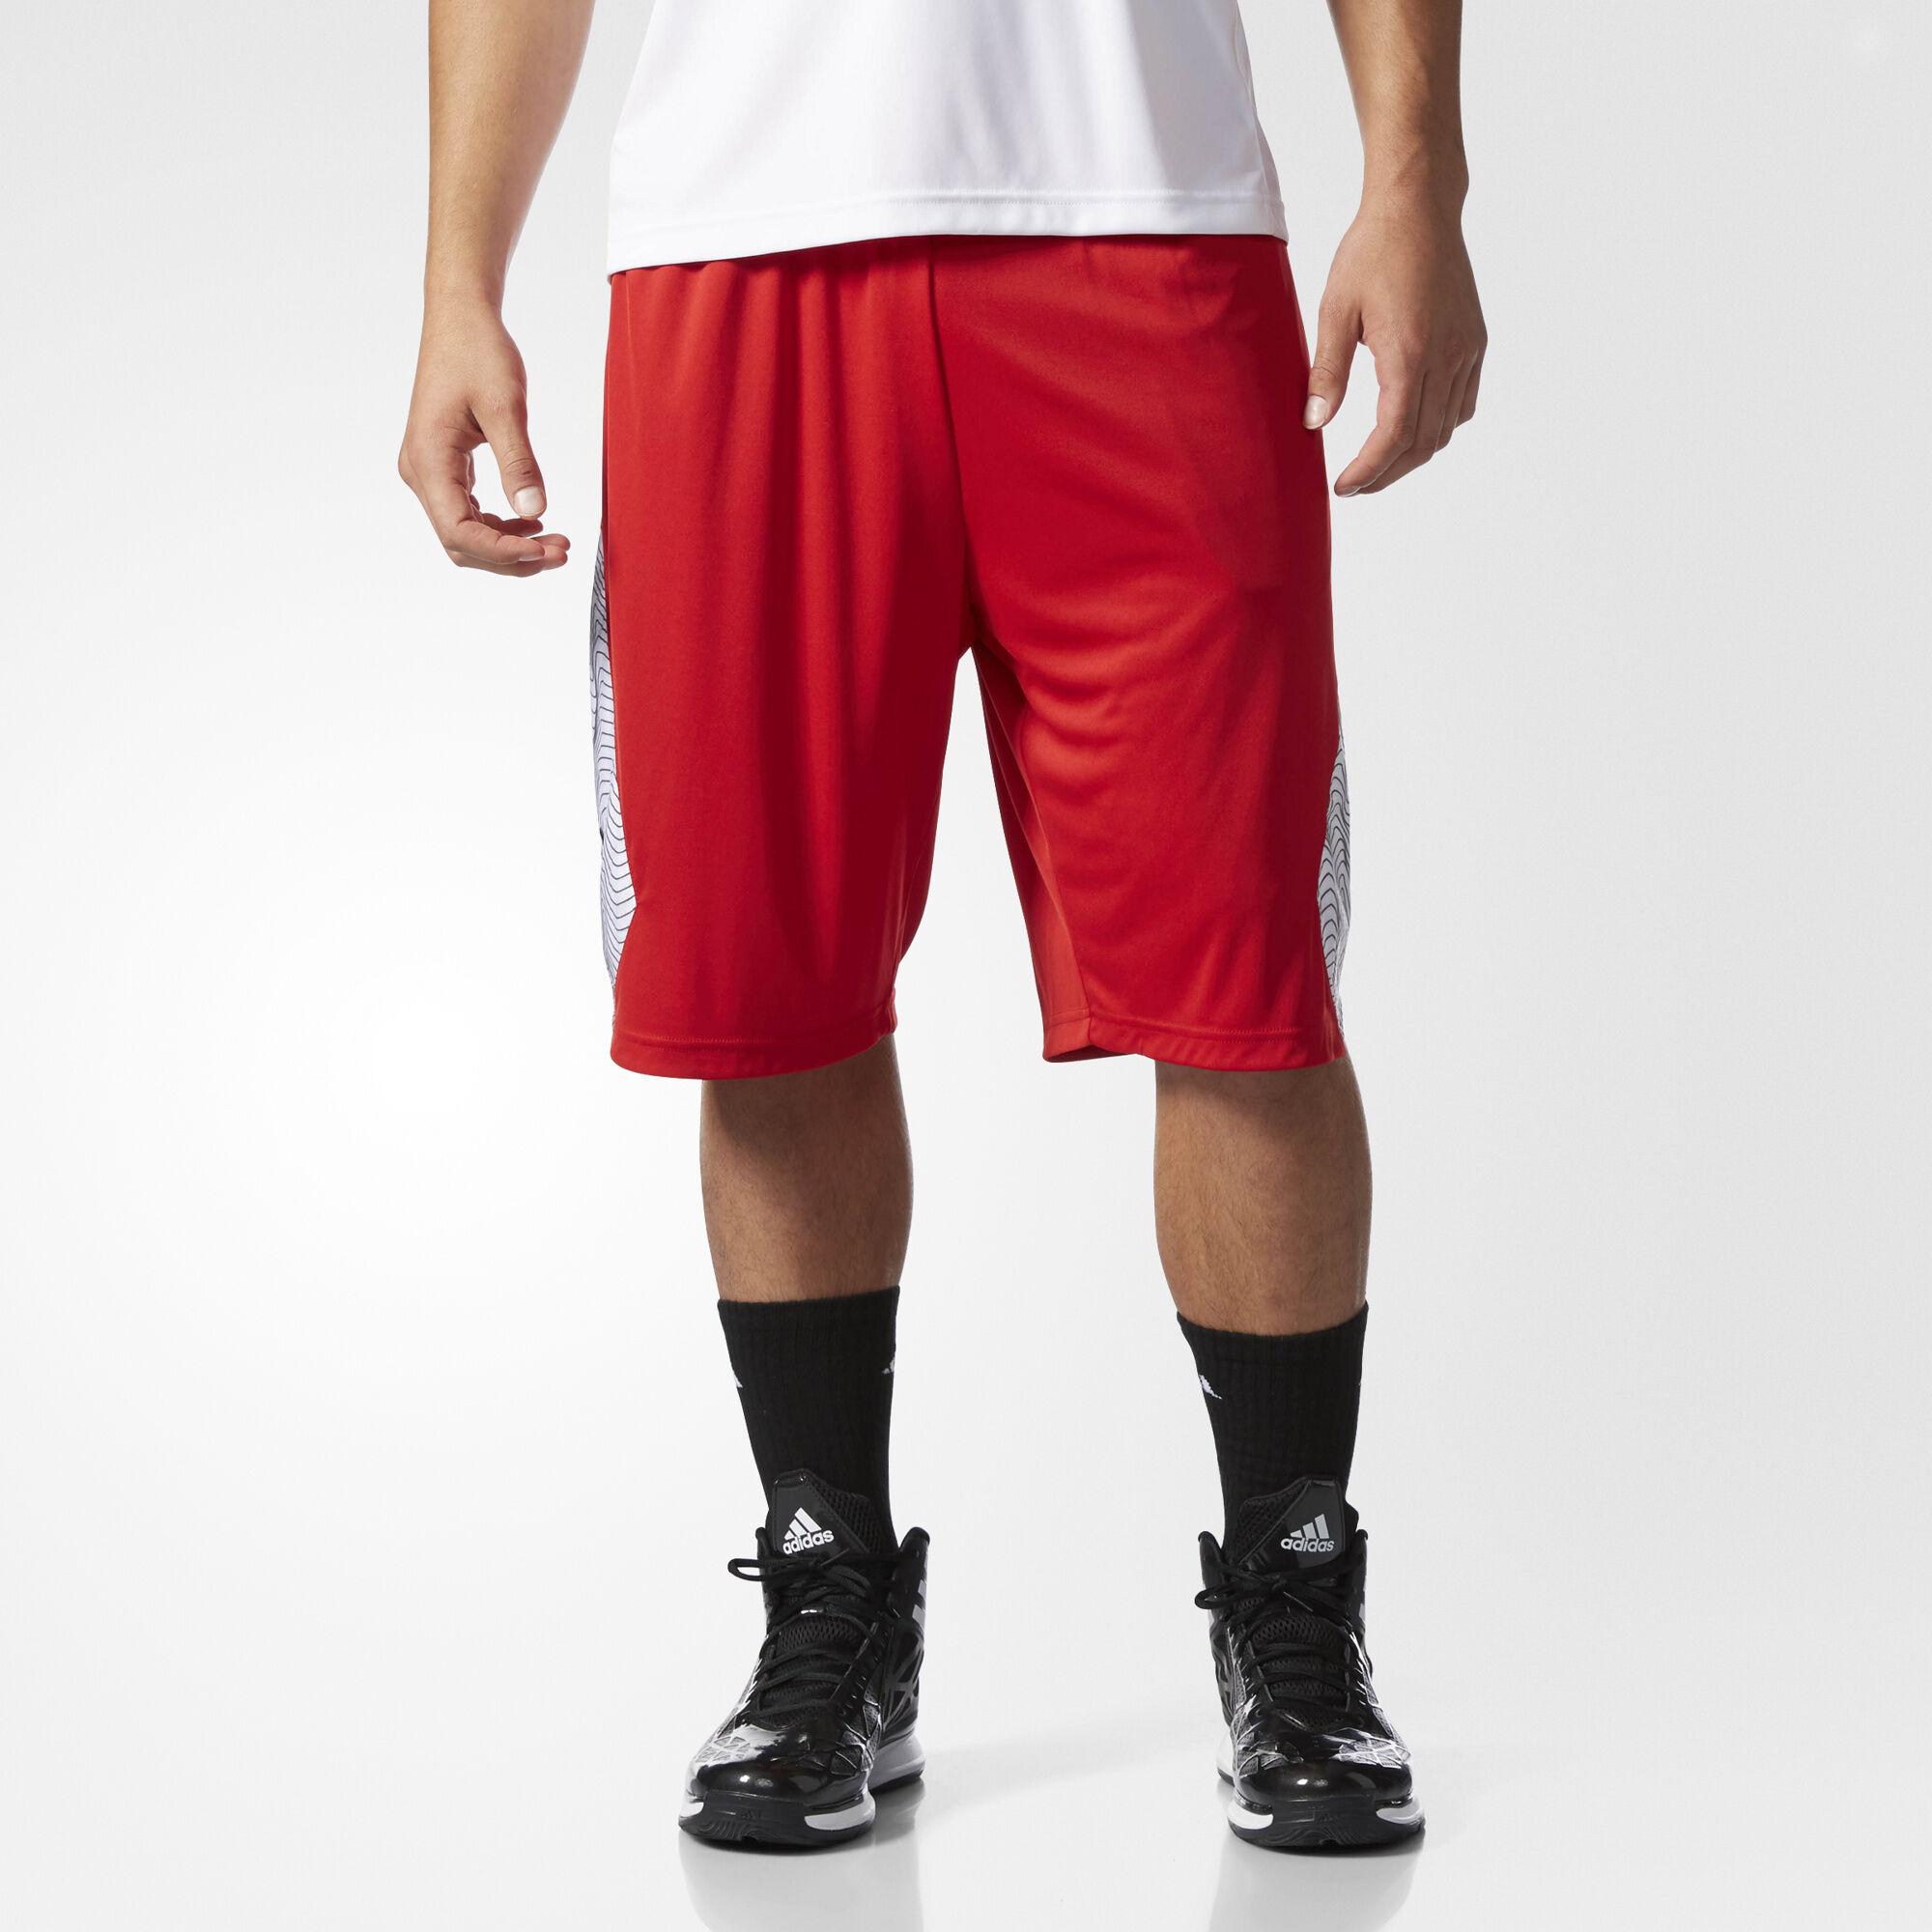 Adidas Shoes Basketball Derrick Rose